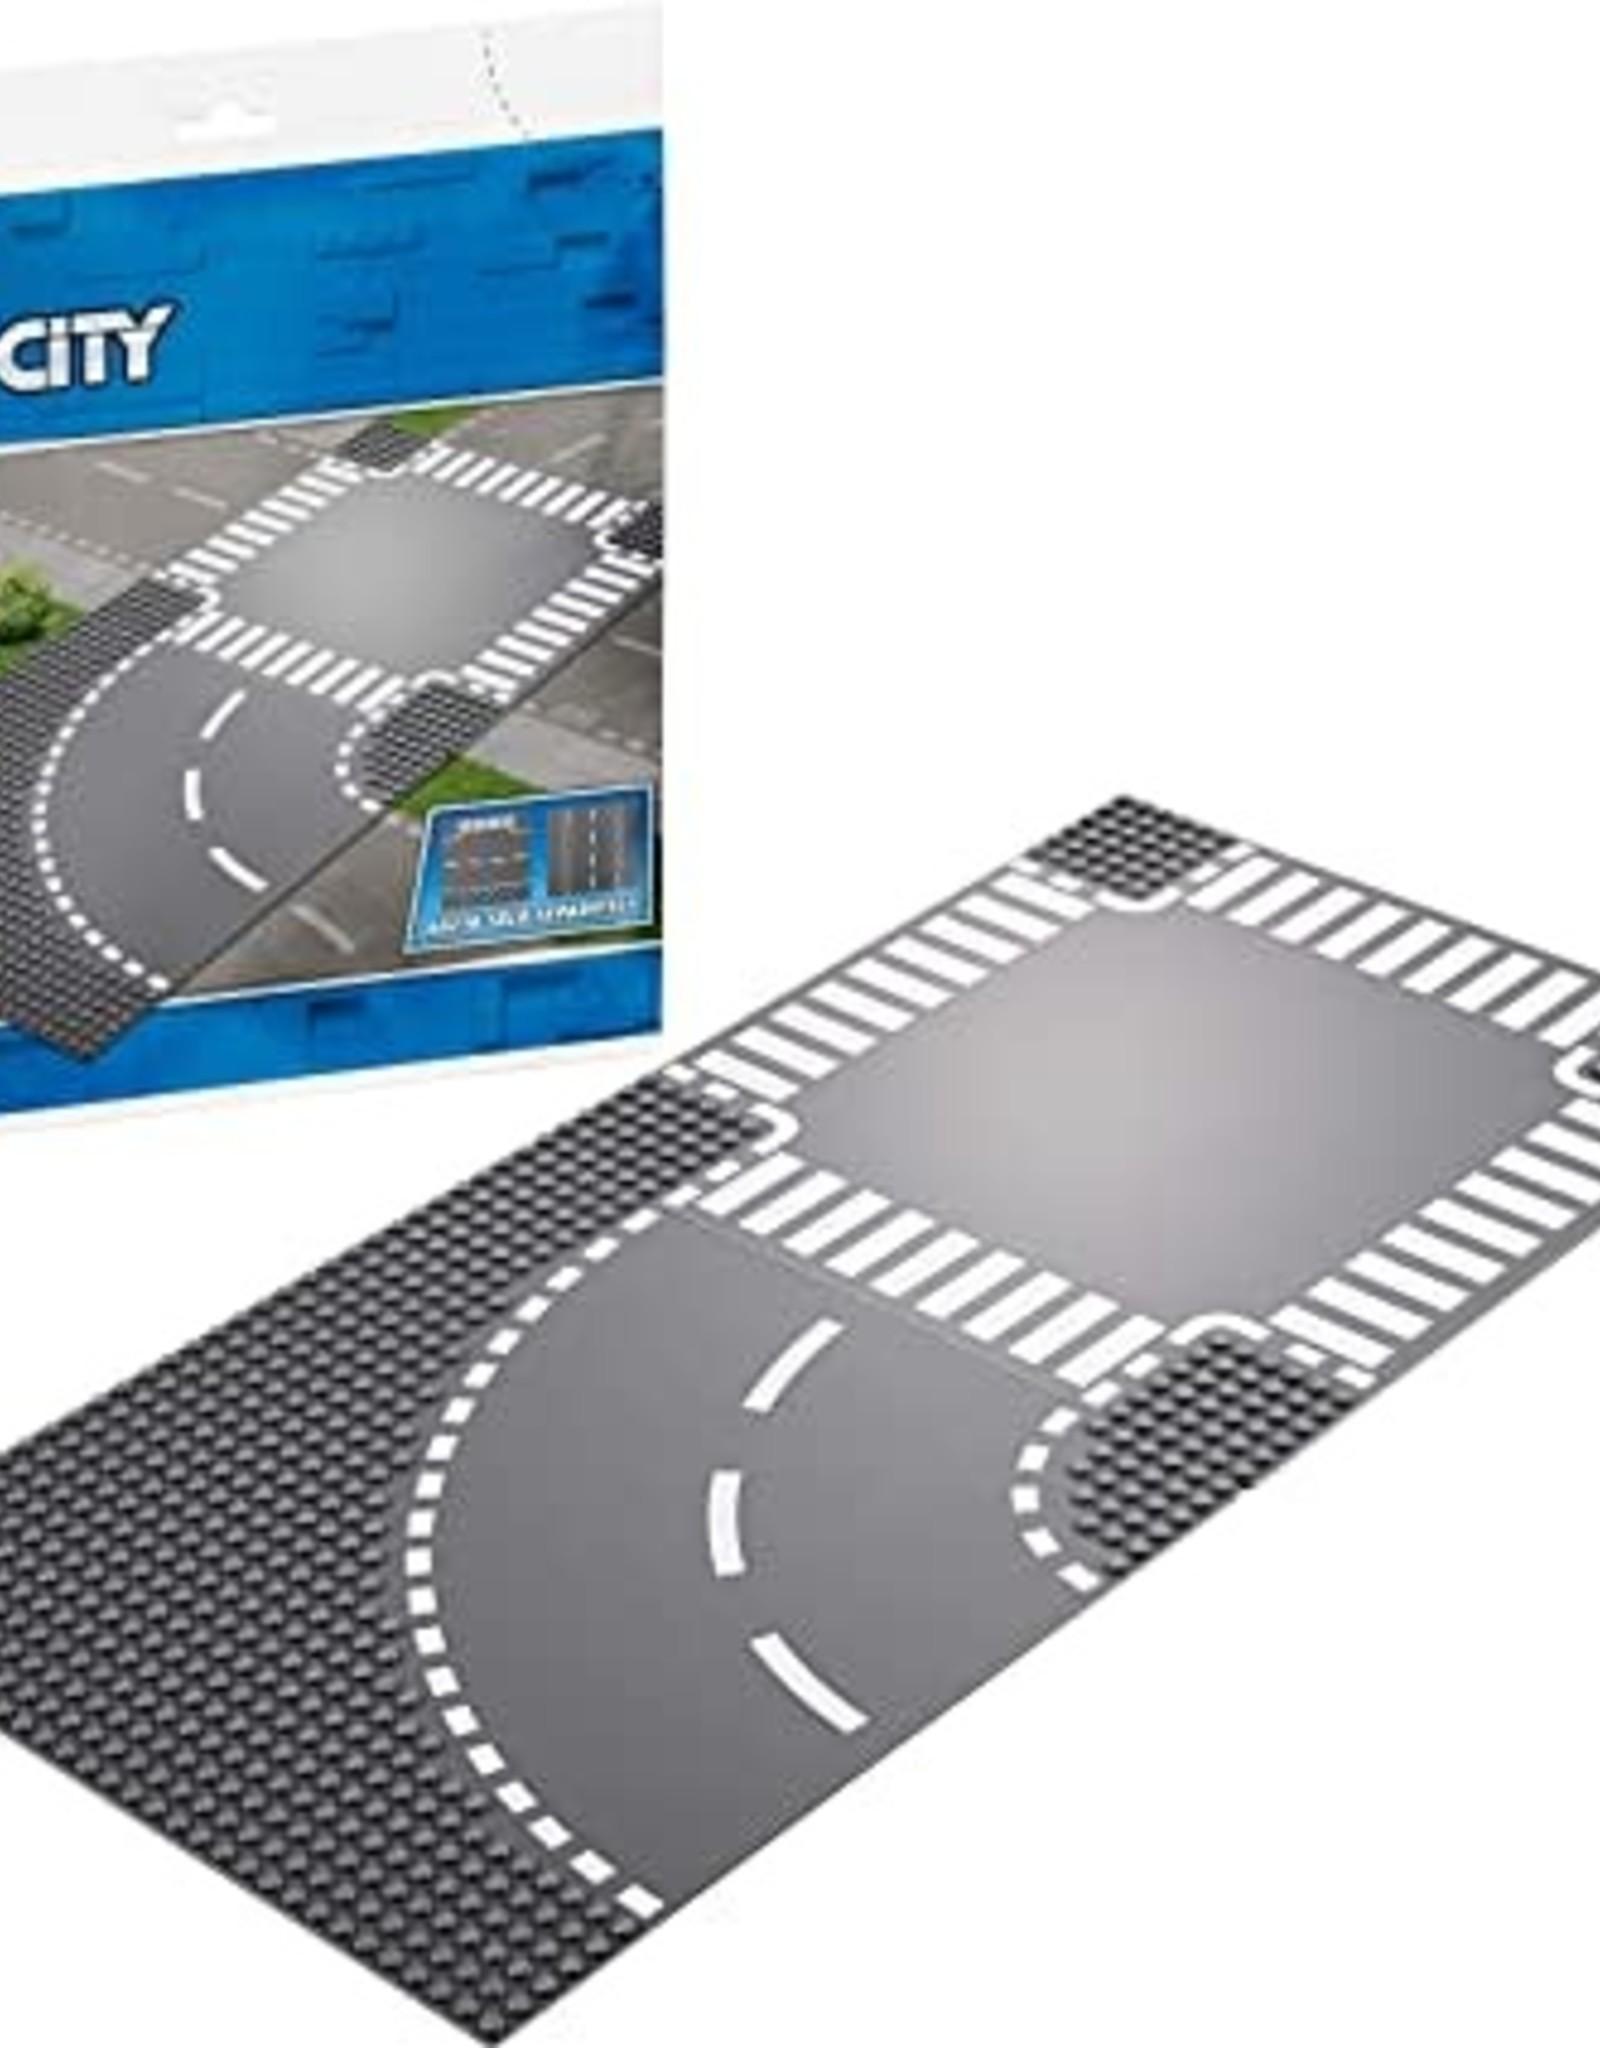 Lego Curve and Crossroad board